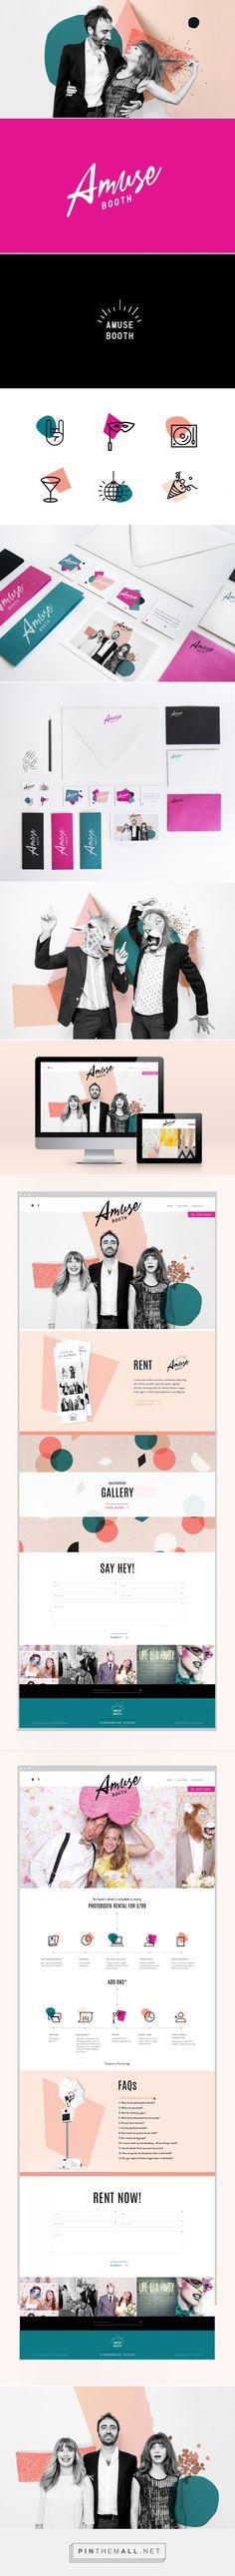 Amuse Booth – Kati Forner